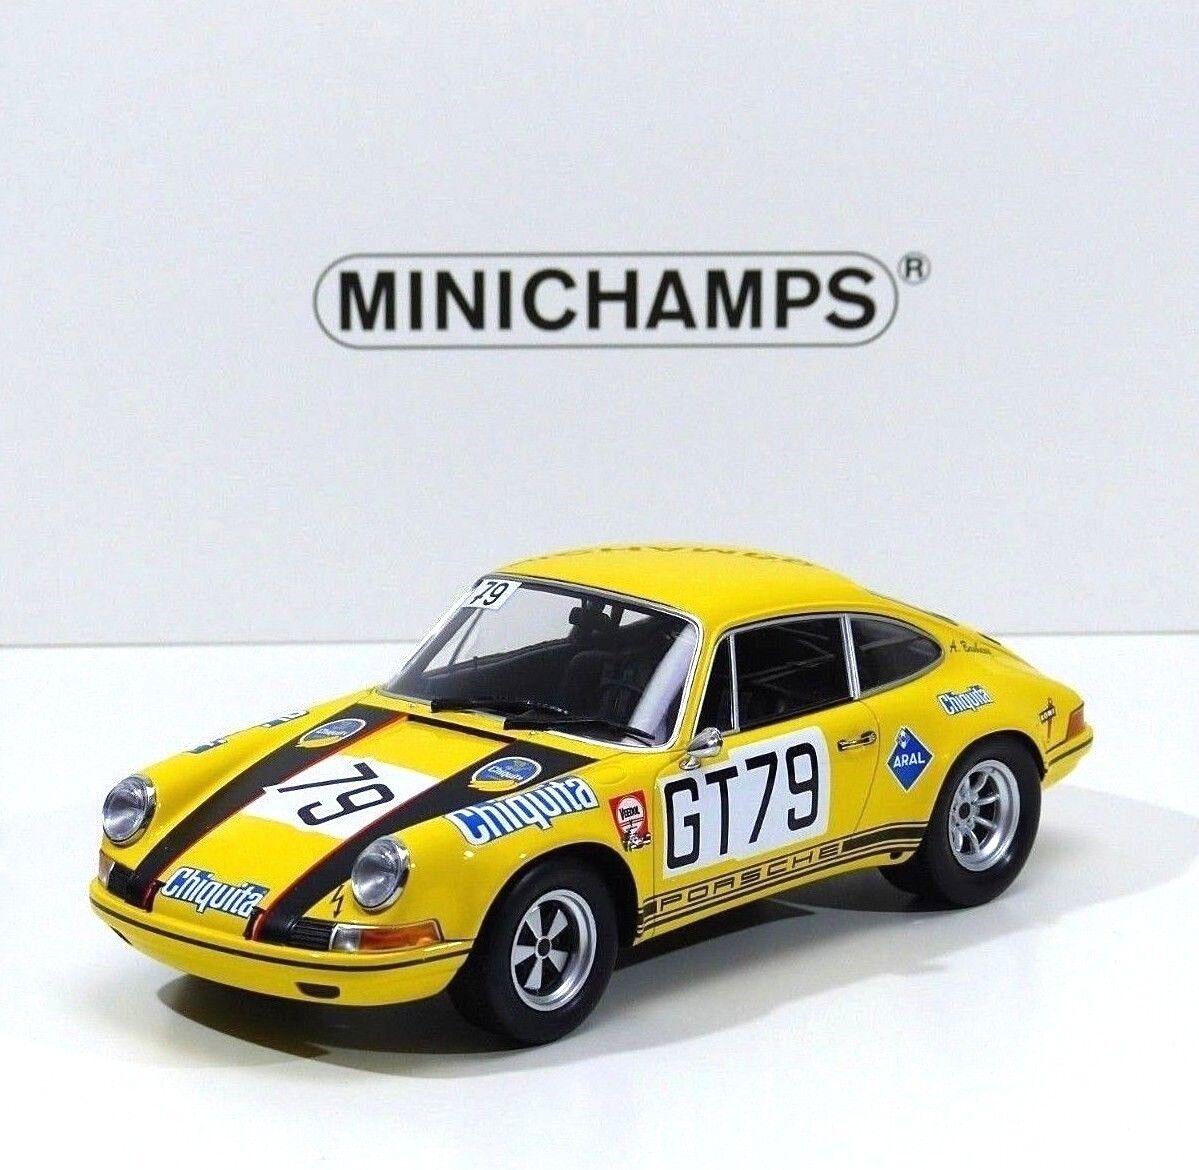 Porsche 911 S AAW gai, Toivonen  79 1000 HM Nurburgring 1970 Minichamps 1 18